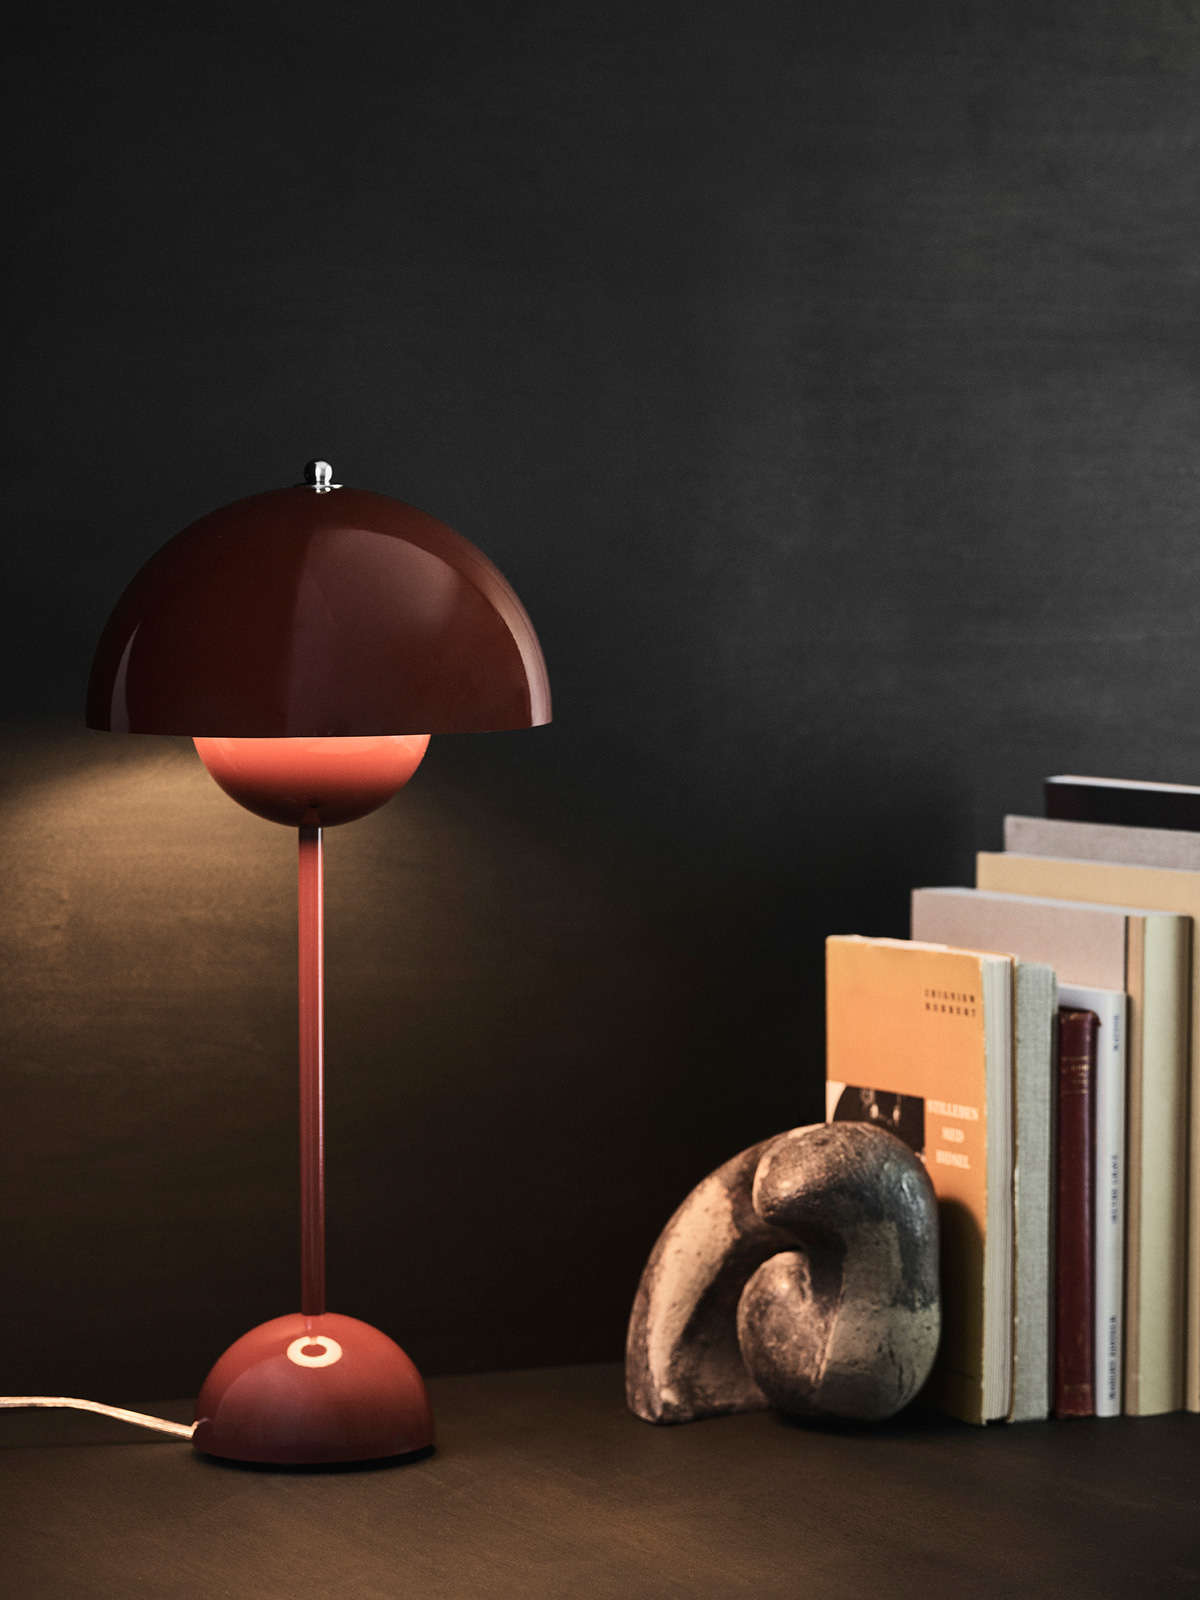 DesignOrt Blog Kultlampen &tradition Flowerpot Vp3 Verner Panton Leuchte Designort Lampen Onlineshop Berlin